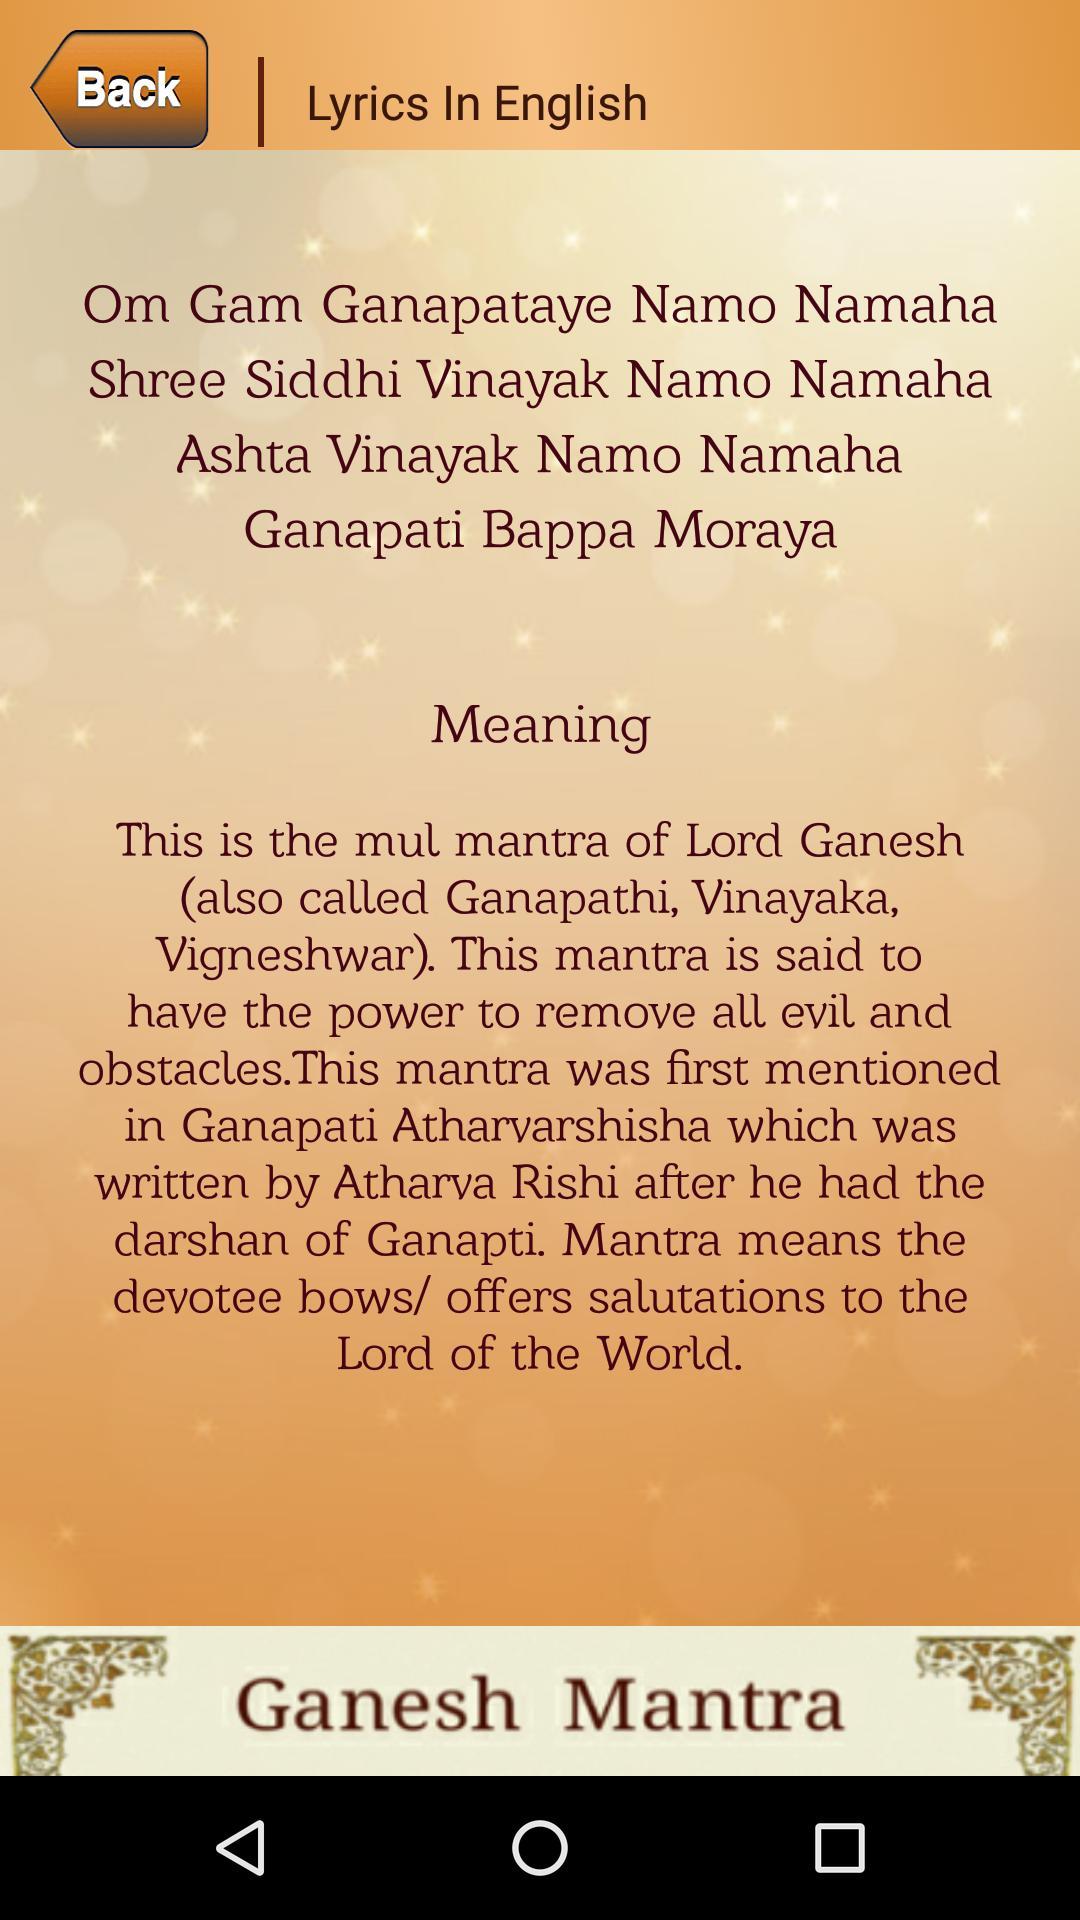 The Om Gam Ganapataye Namaha Lyrics Meaning {Forum Aden}